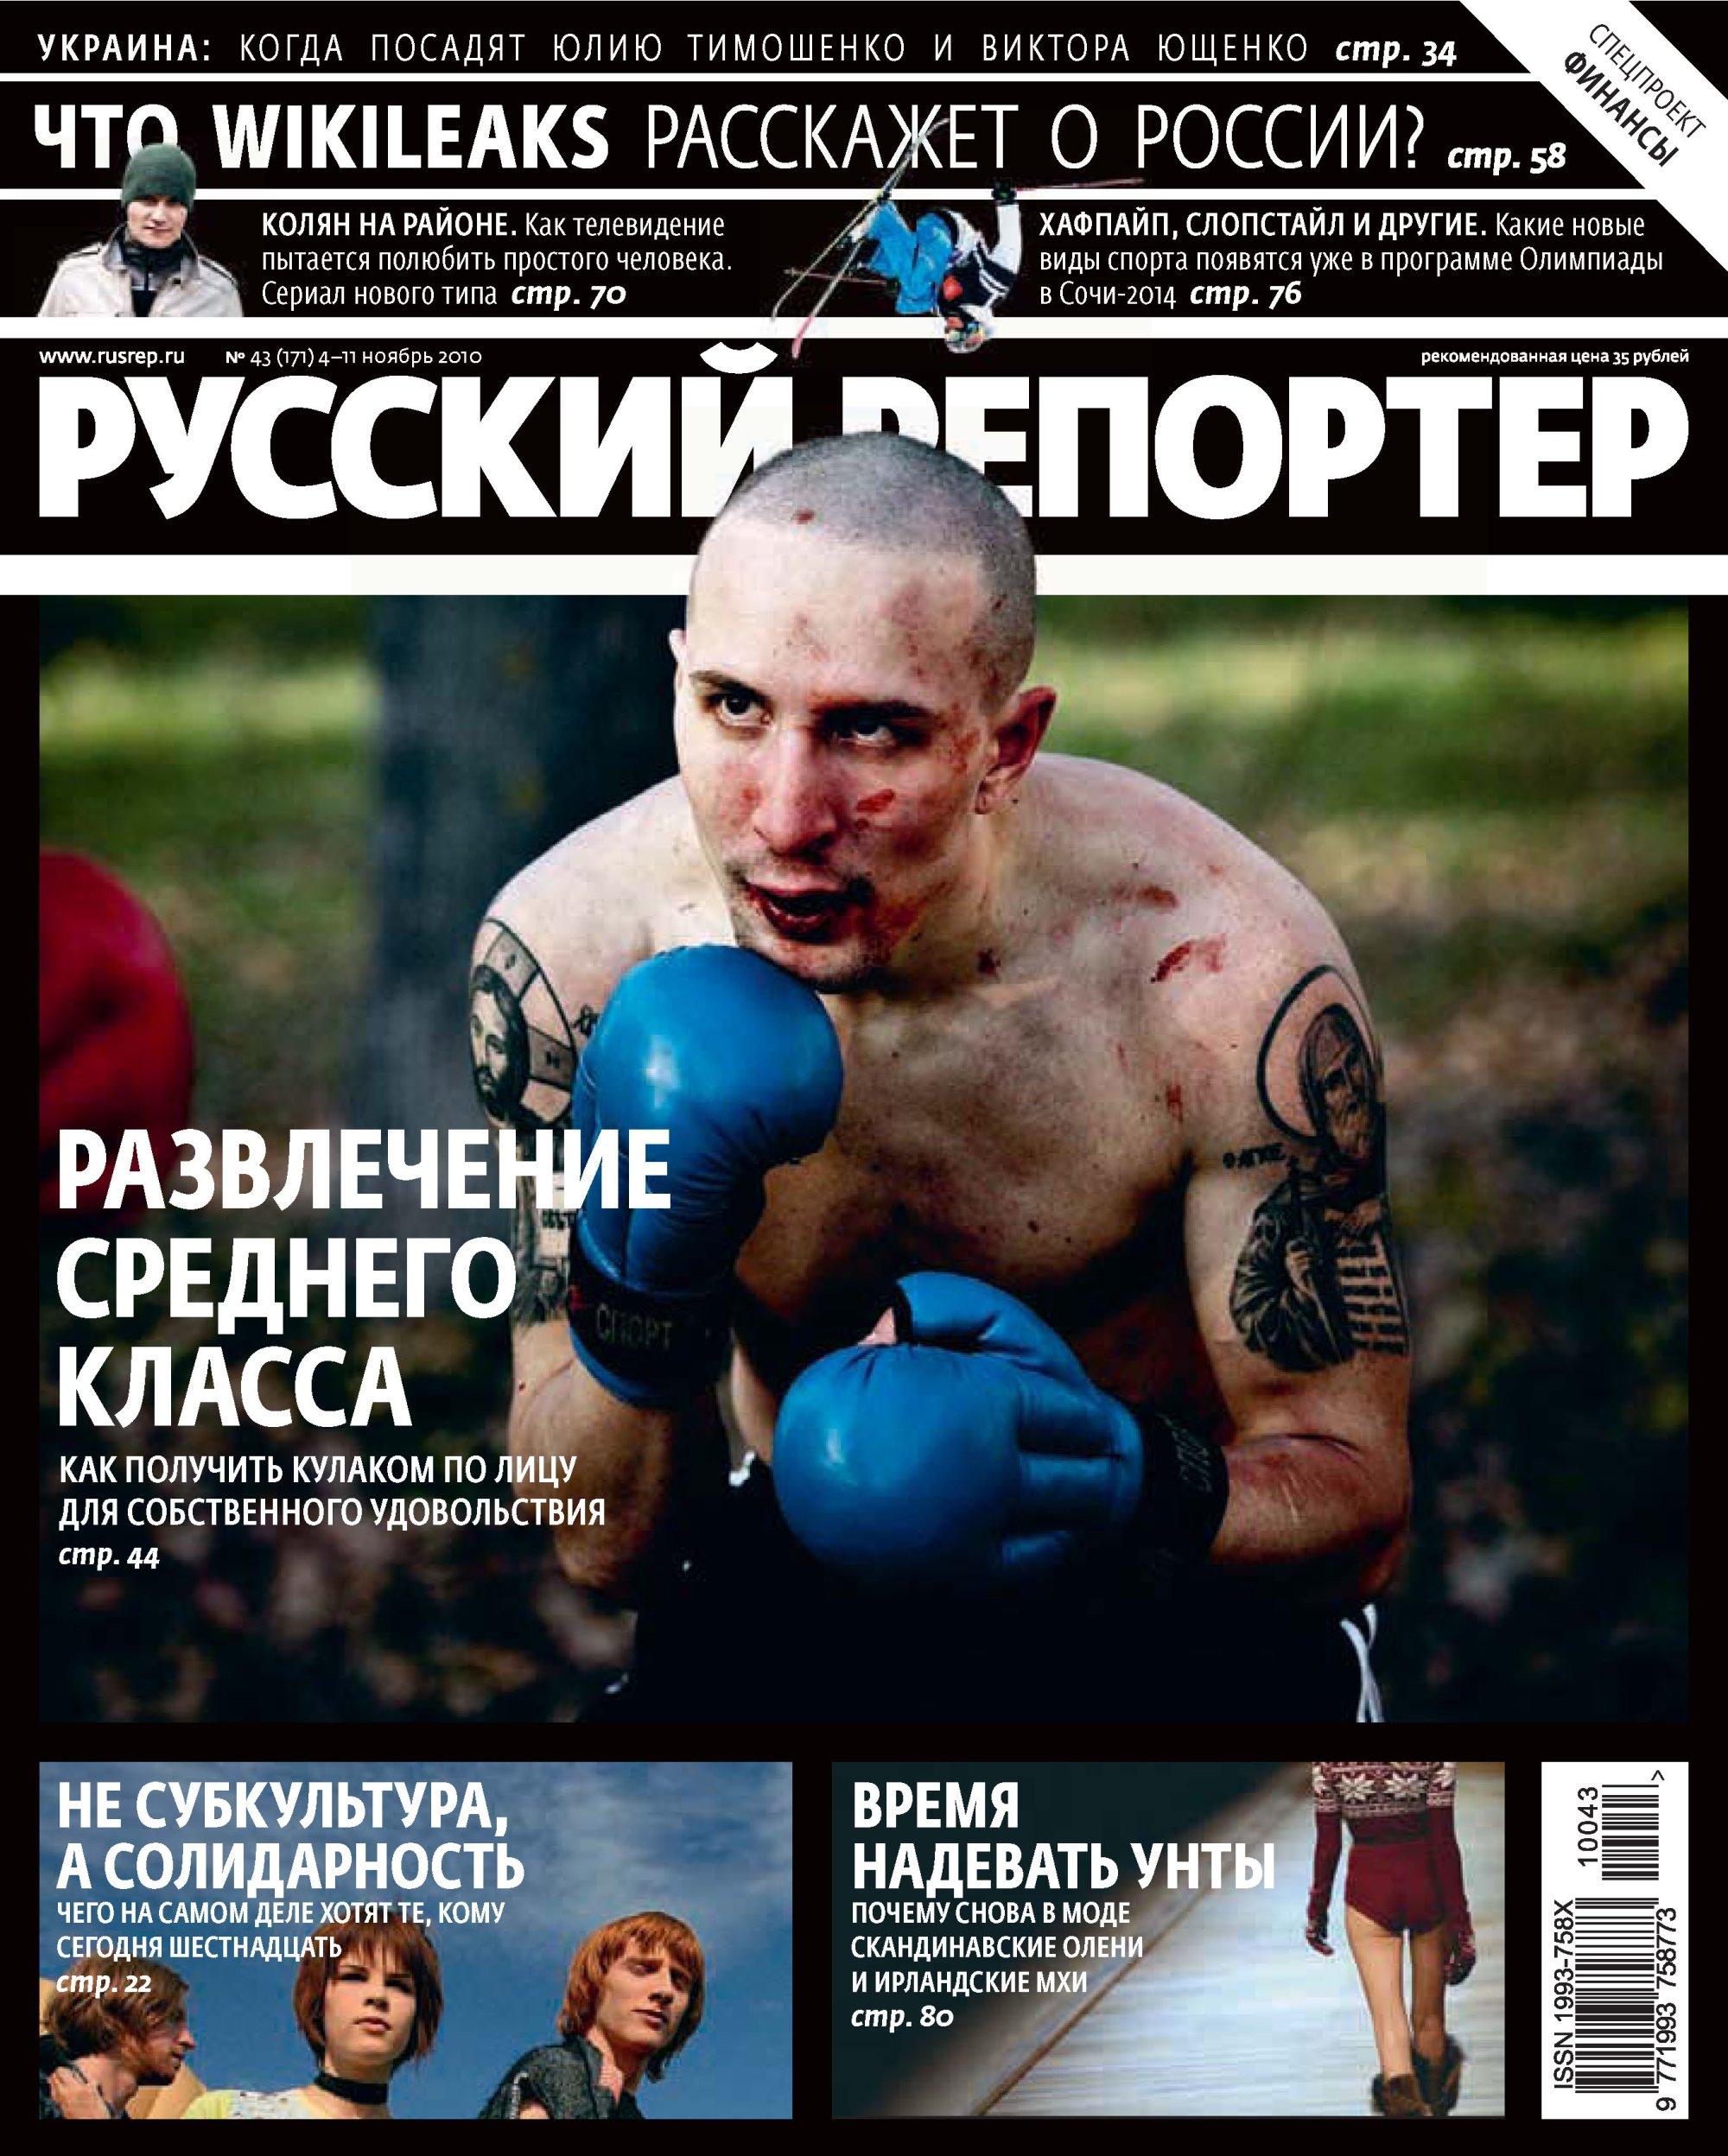 Русский Репортер № 43/2010